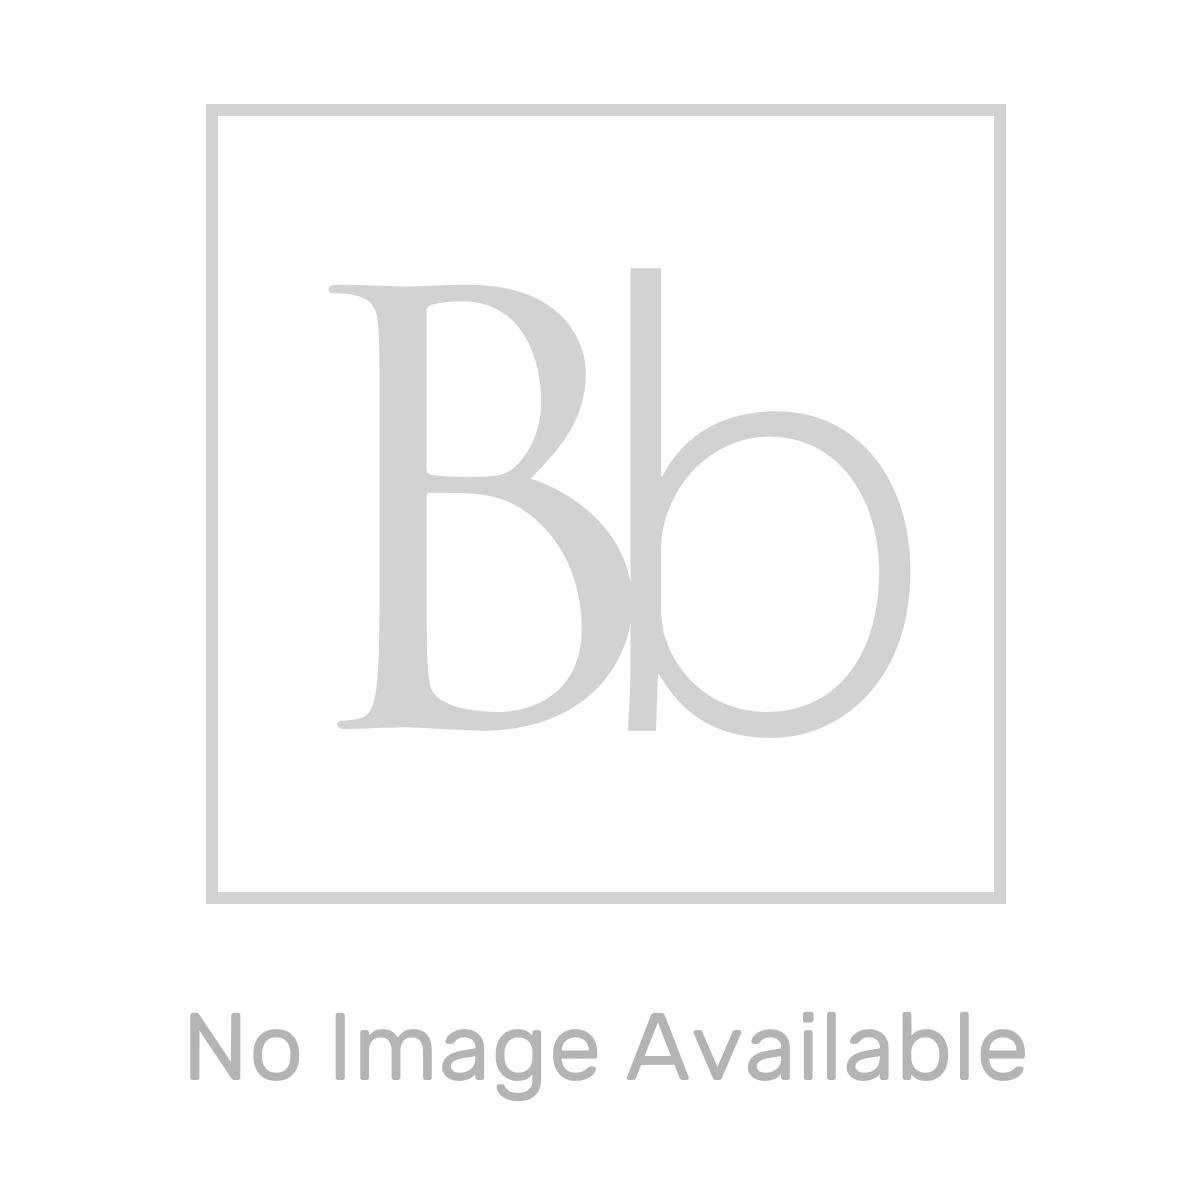 Salamander Home Boost Typical Installation